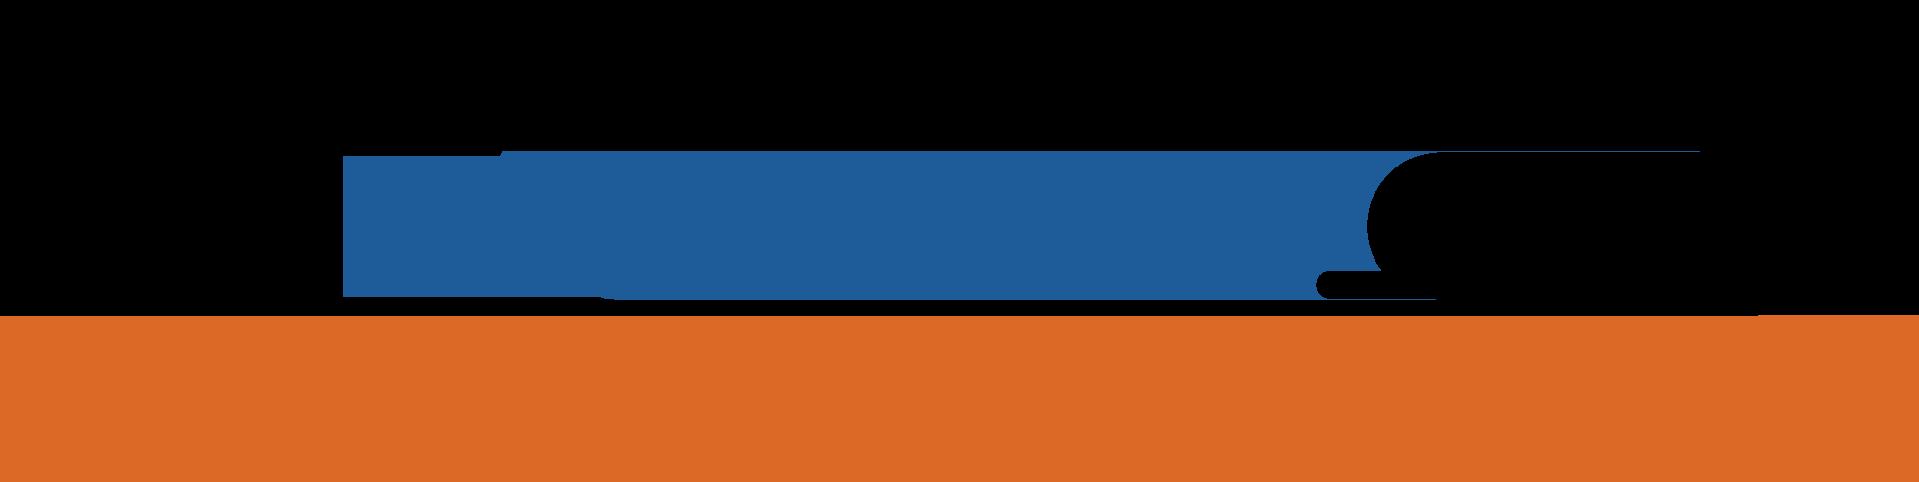 grp-web-new-logo